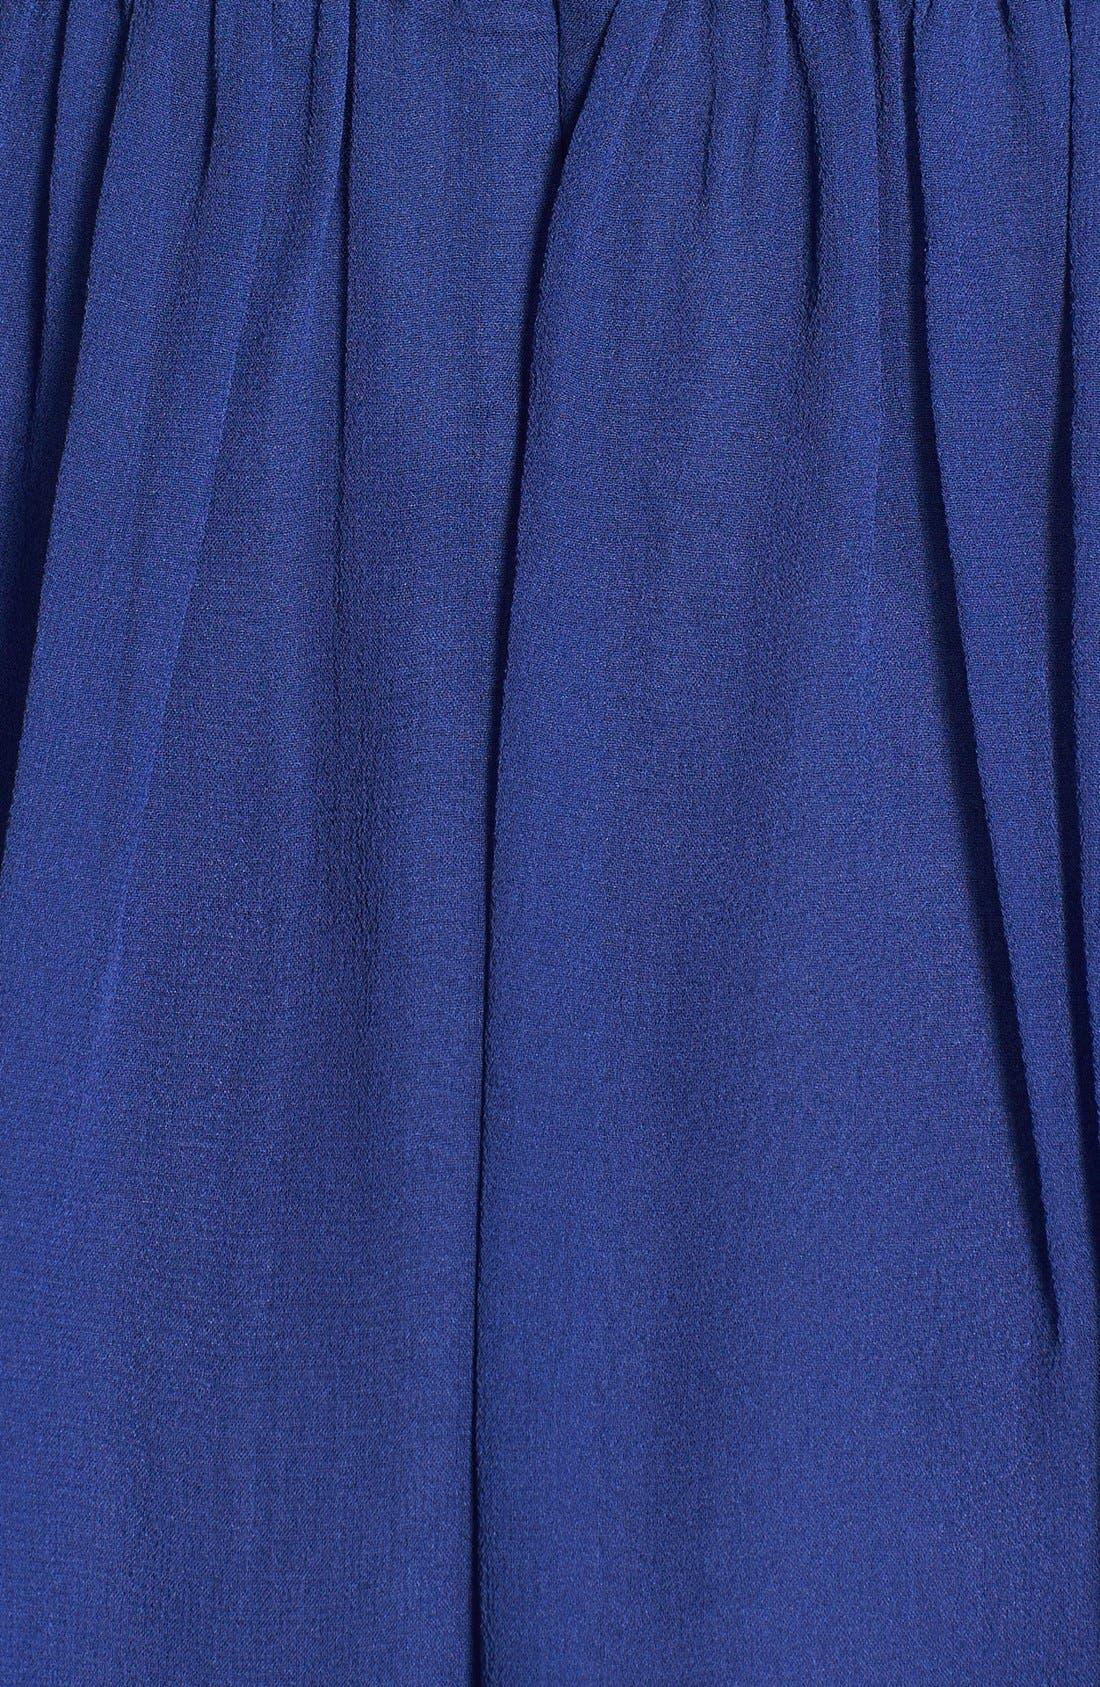 'Morgan' Strapless Silk Chiffon Dress,                             Alternate thumbnail 138, color,